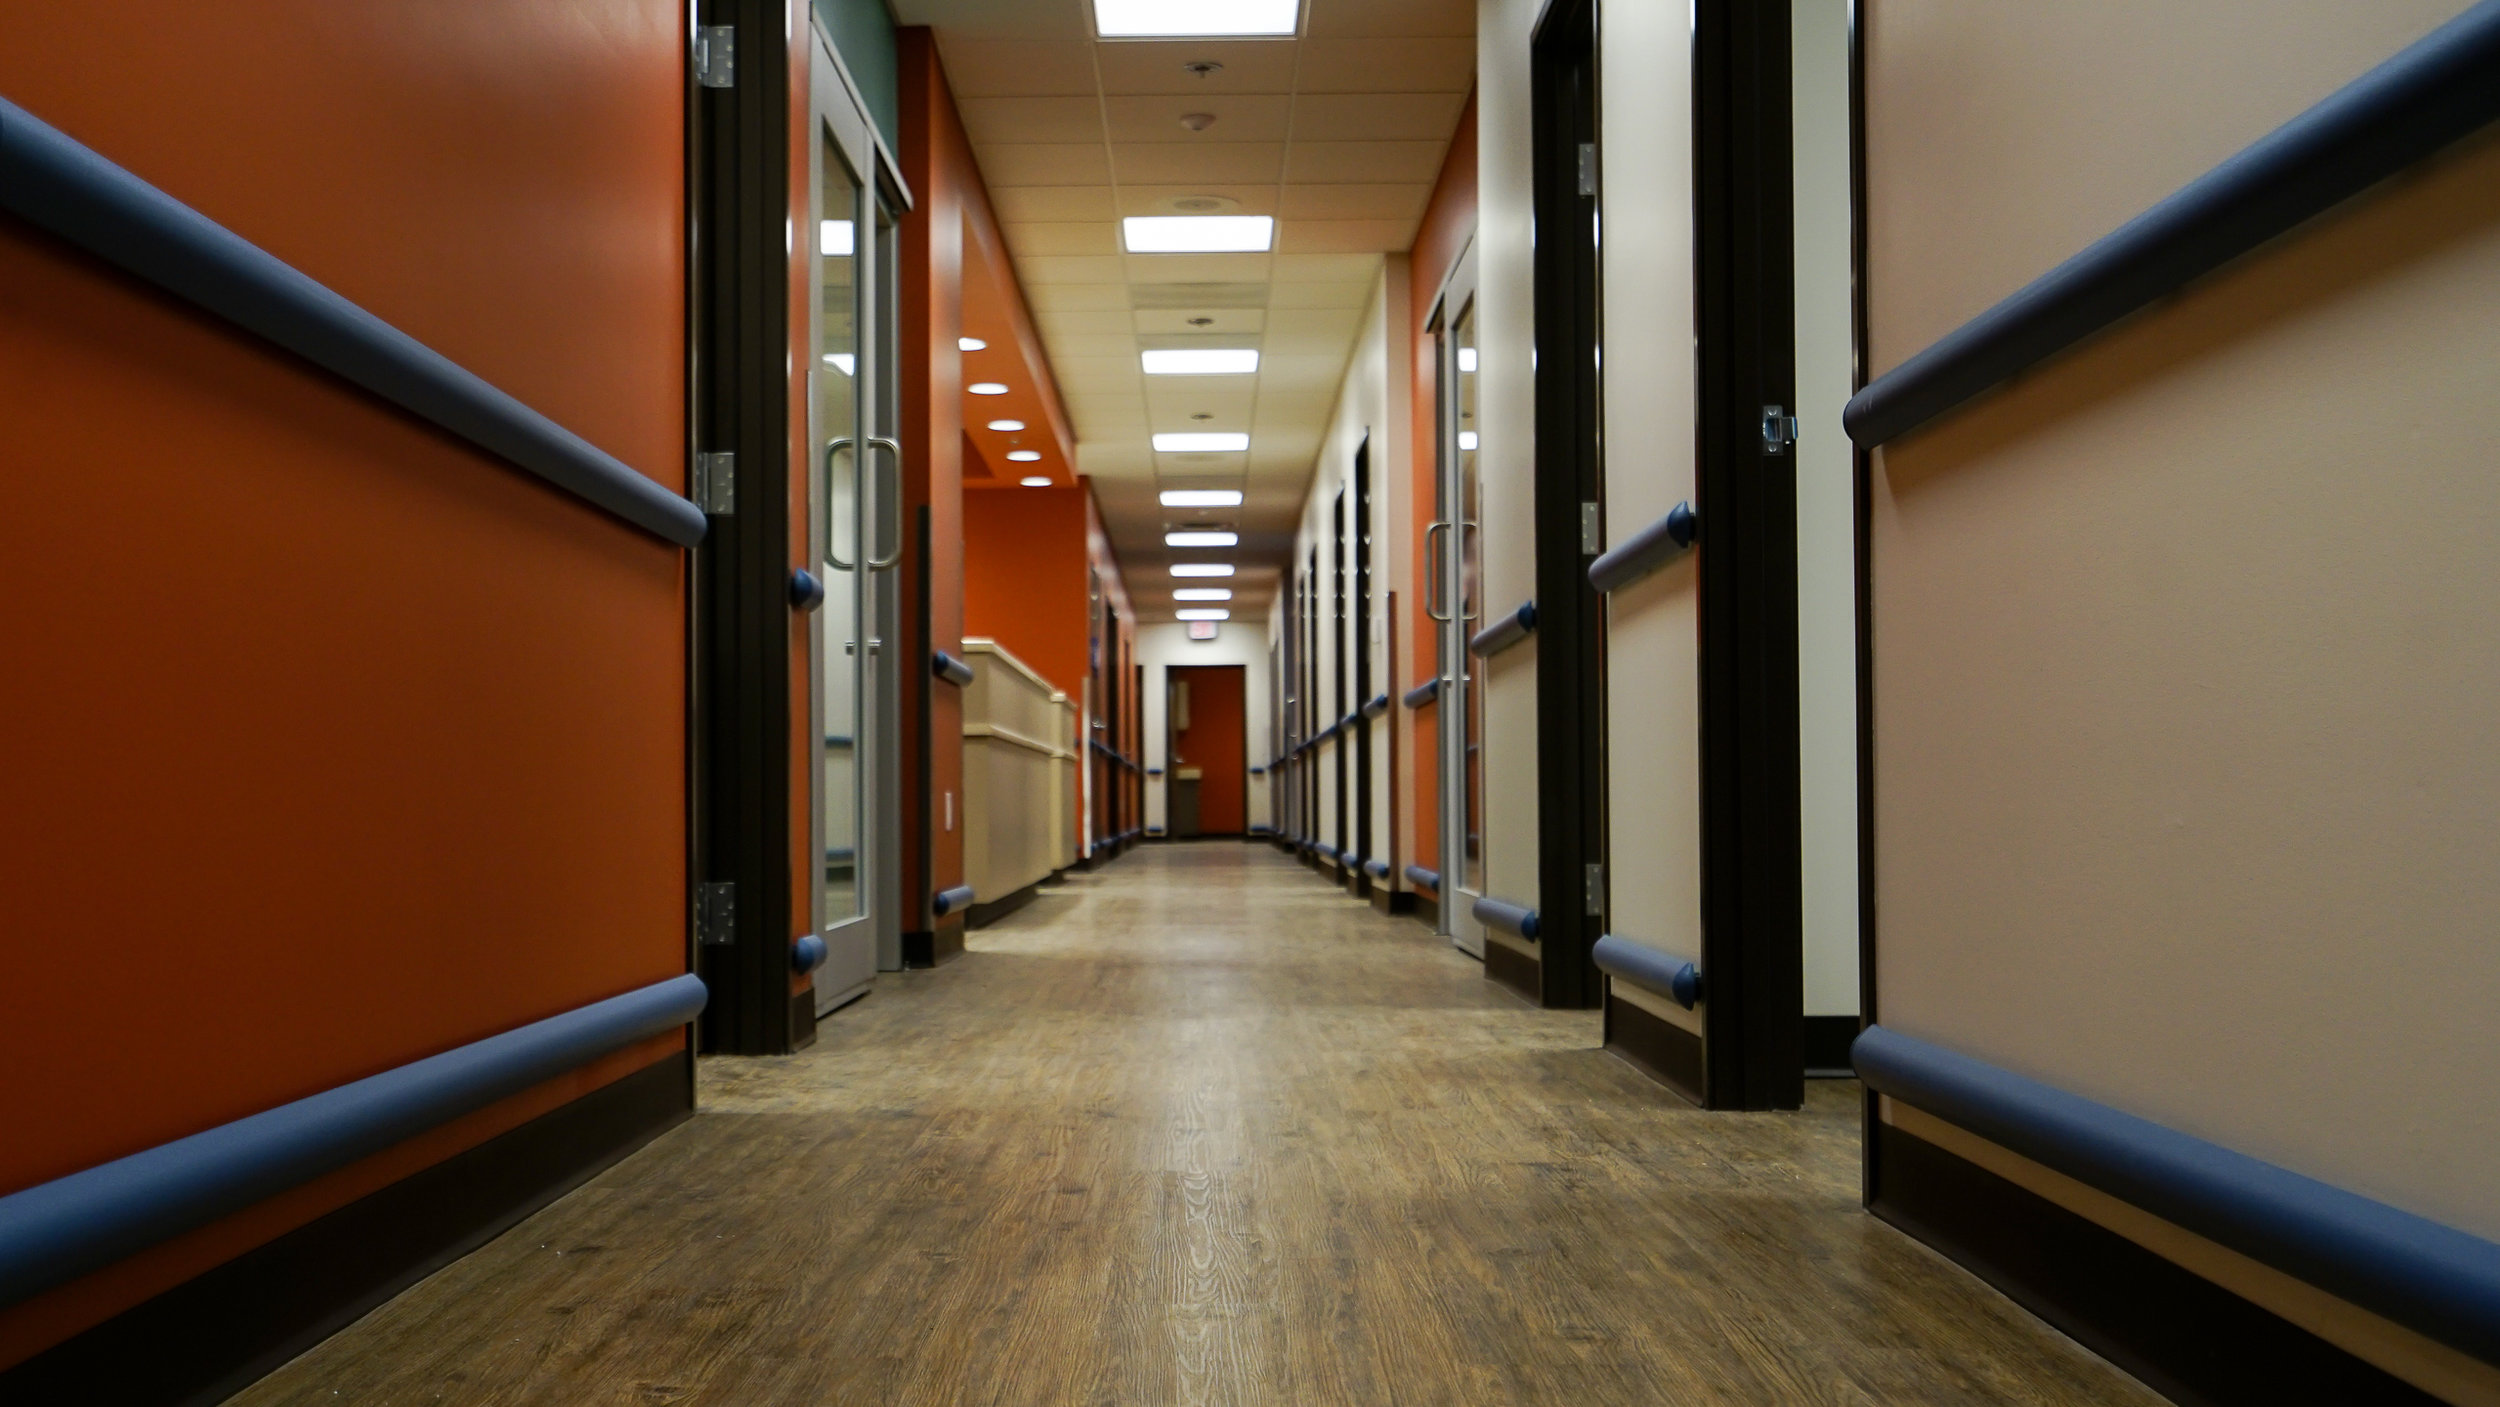 Tenant Improvement for Mountain Health Community Center